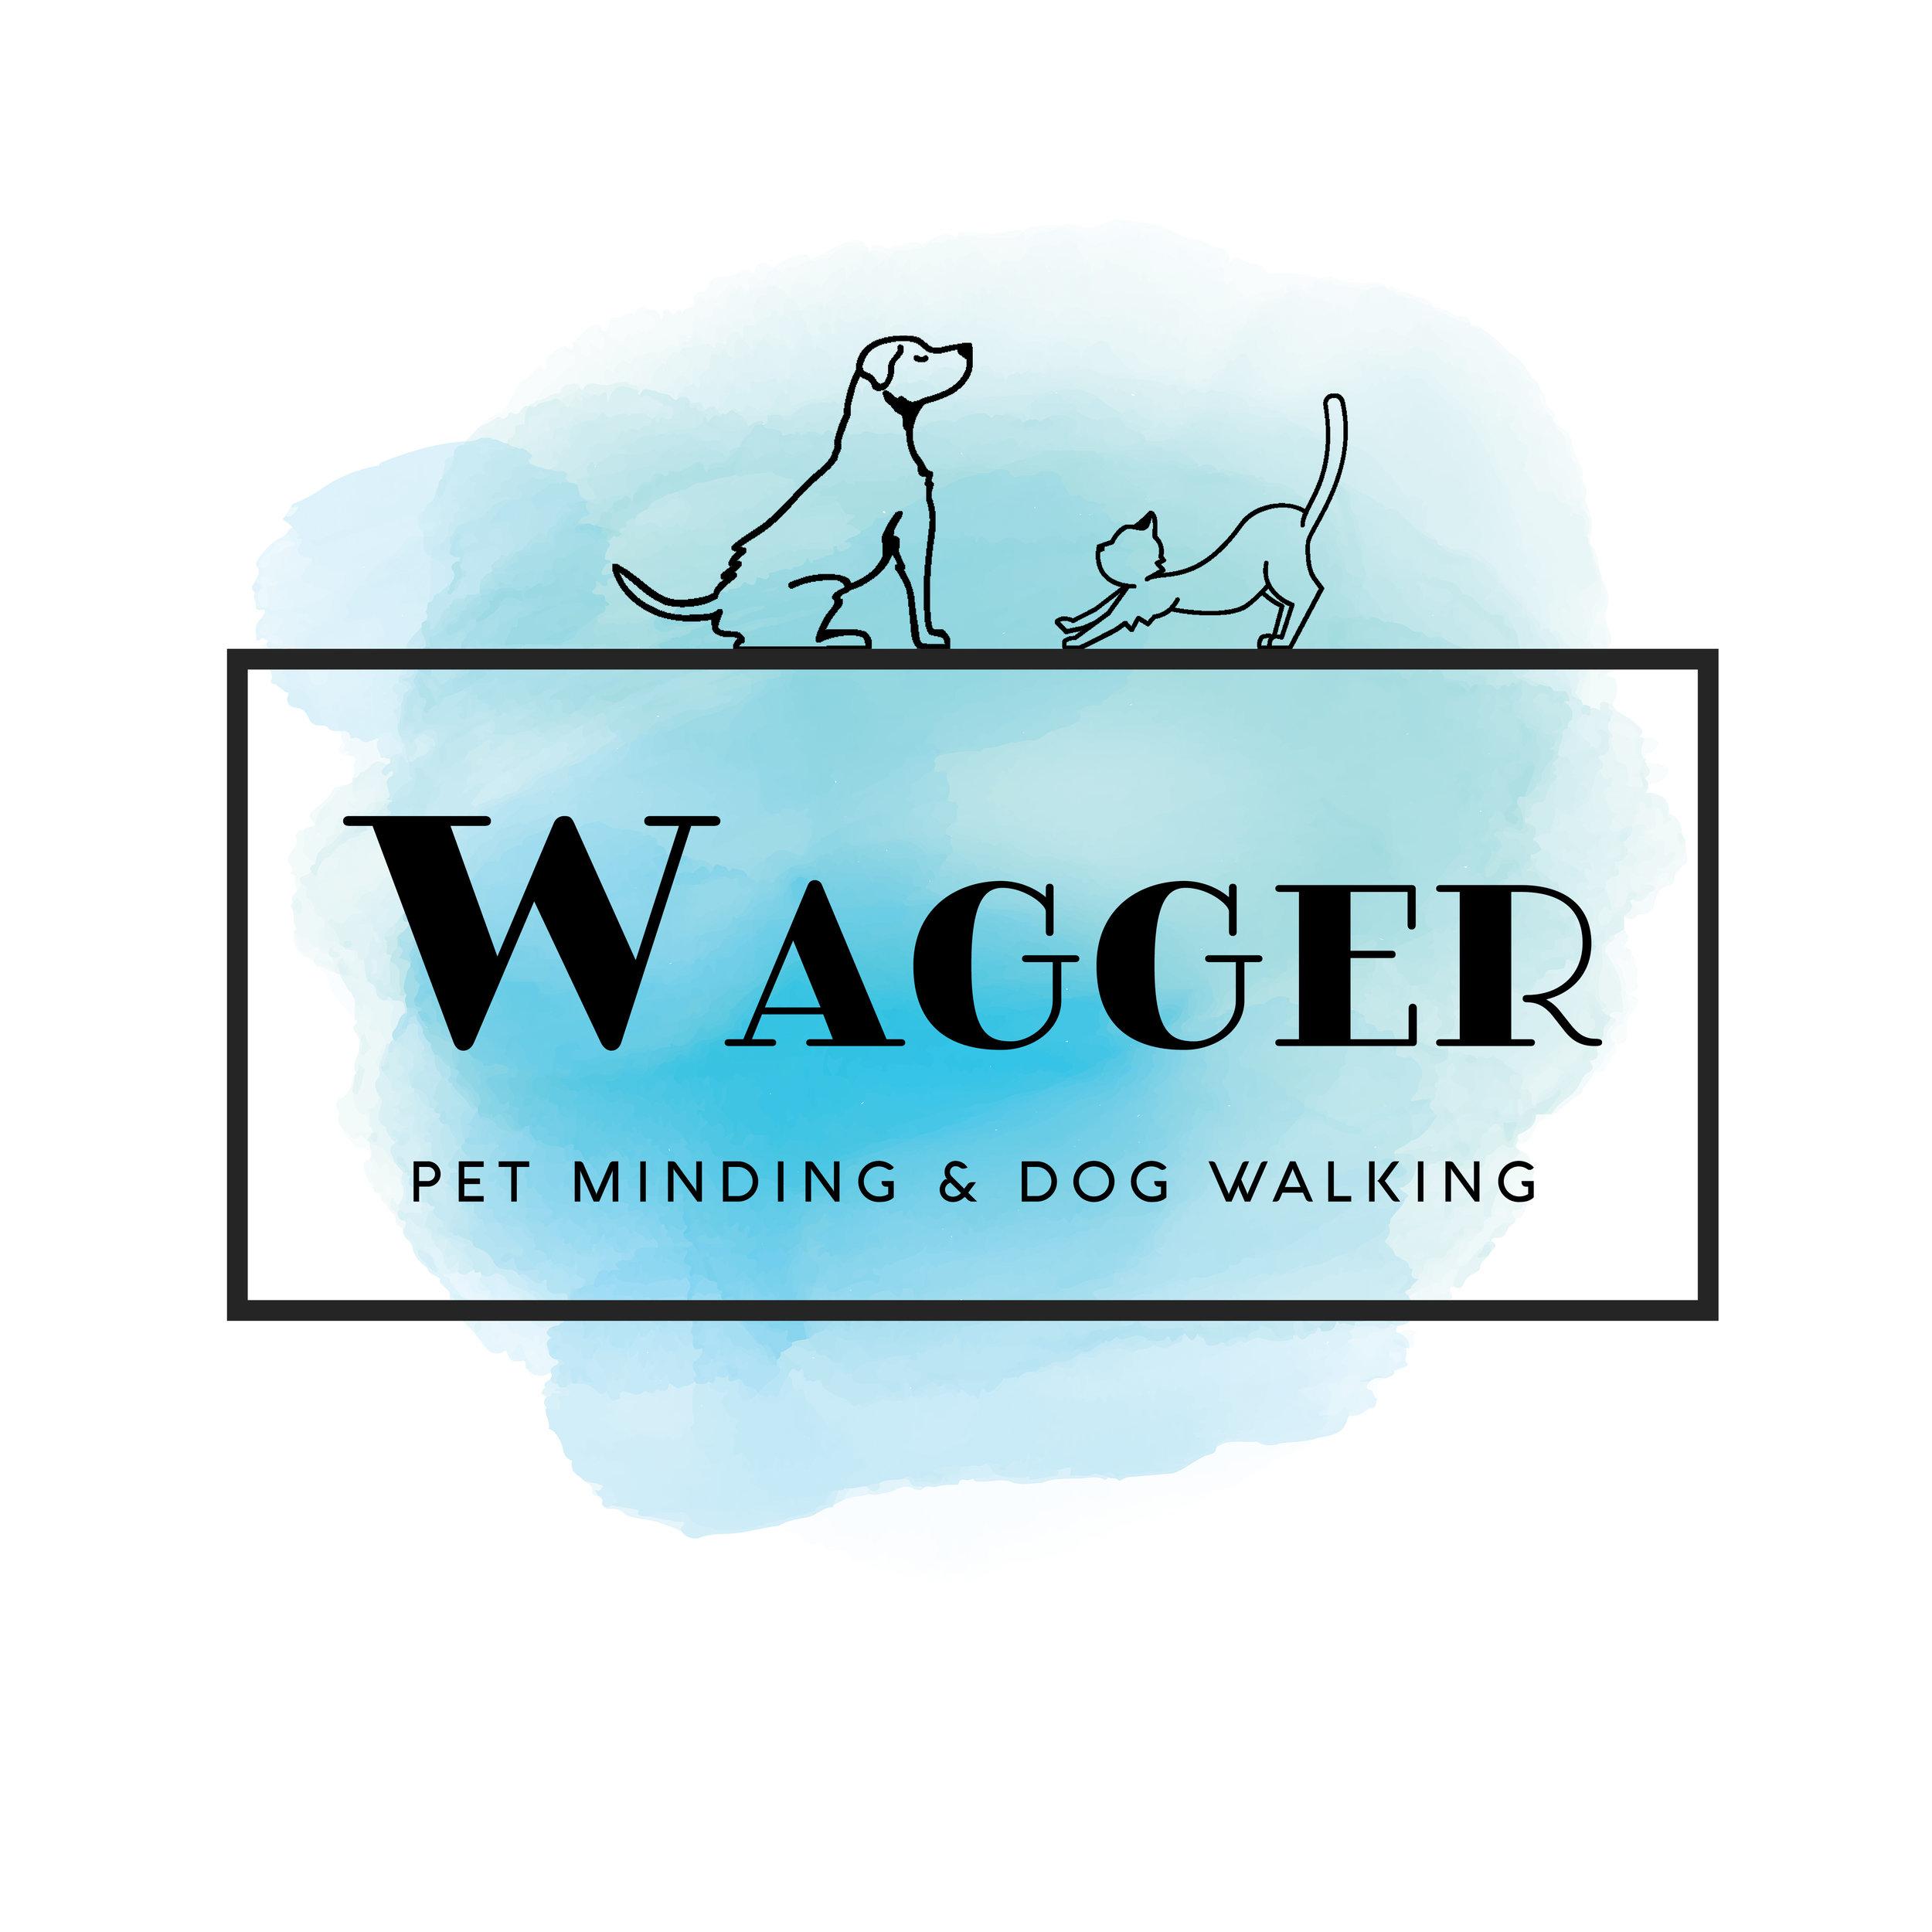 Wagger FINAL LOGO - smaller file.jpg